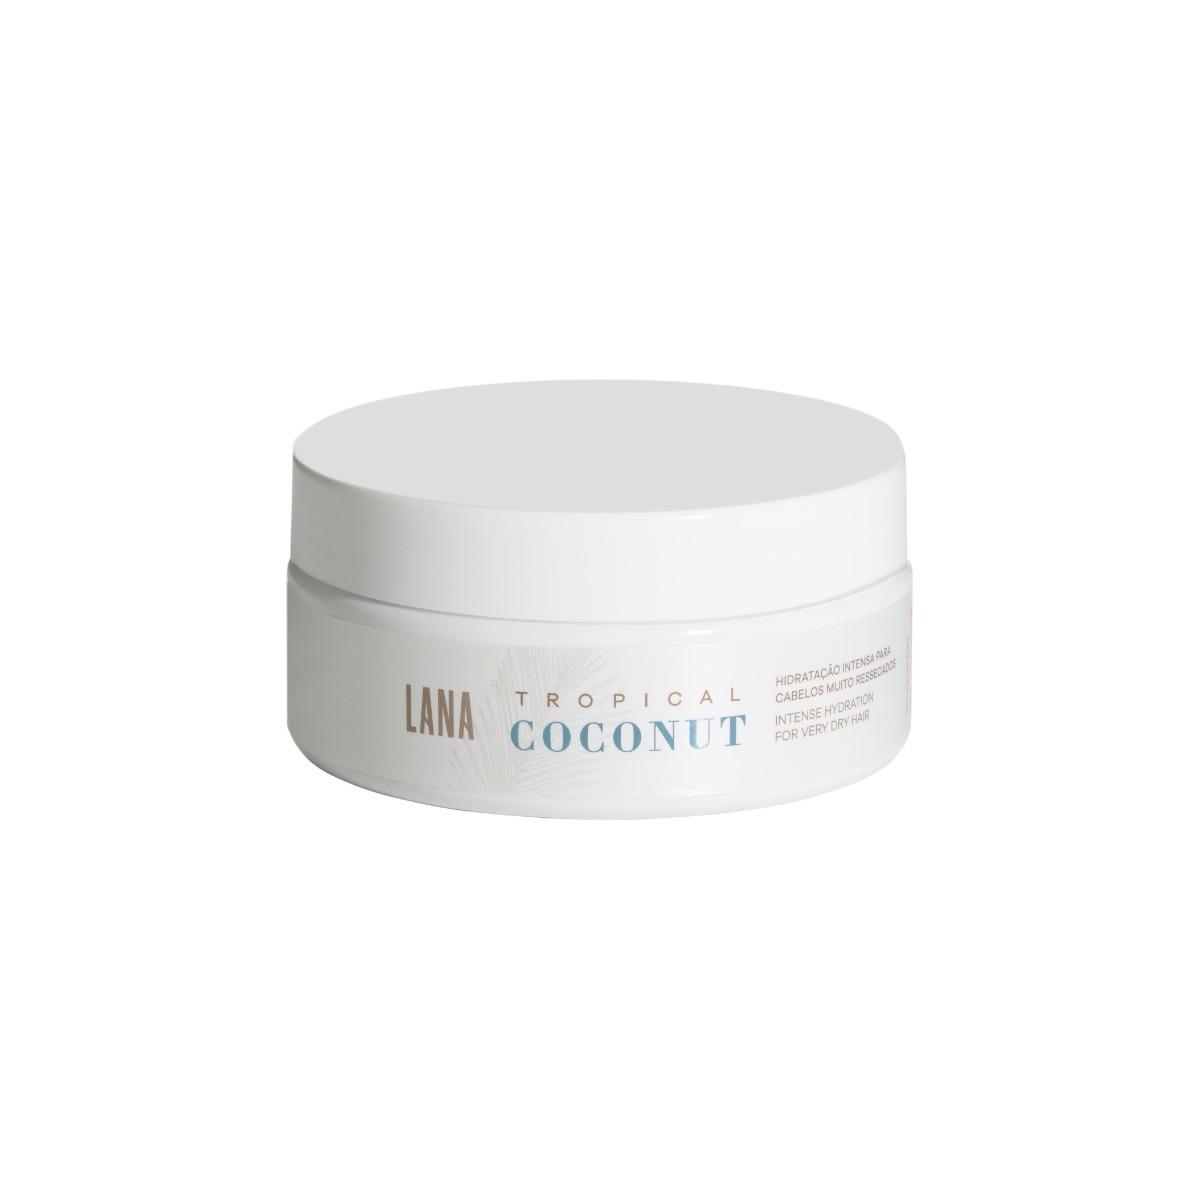 Lana Brasiles - Máscara Tropical Coconut Hidratação Intensa 200g